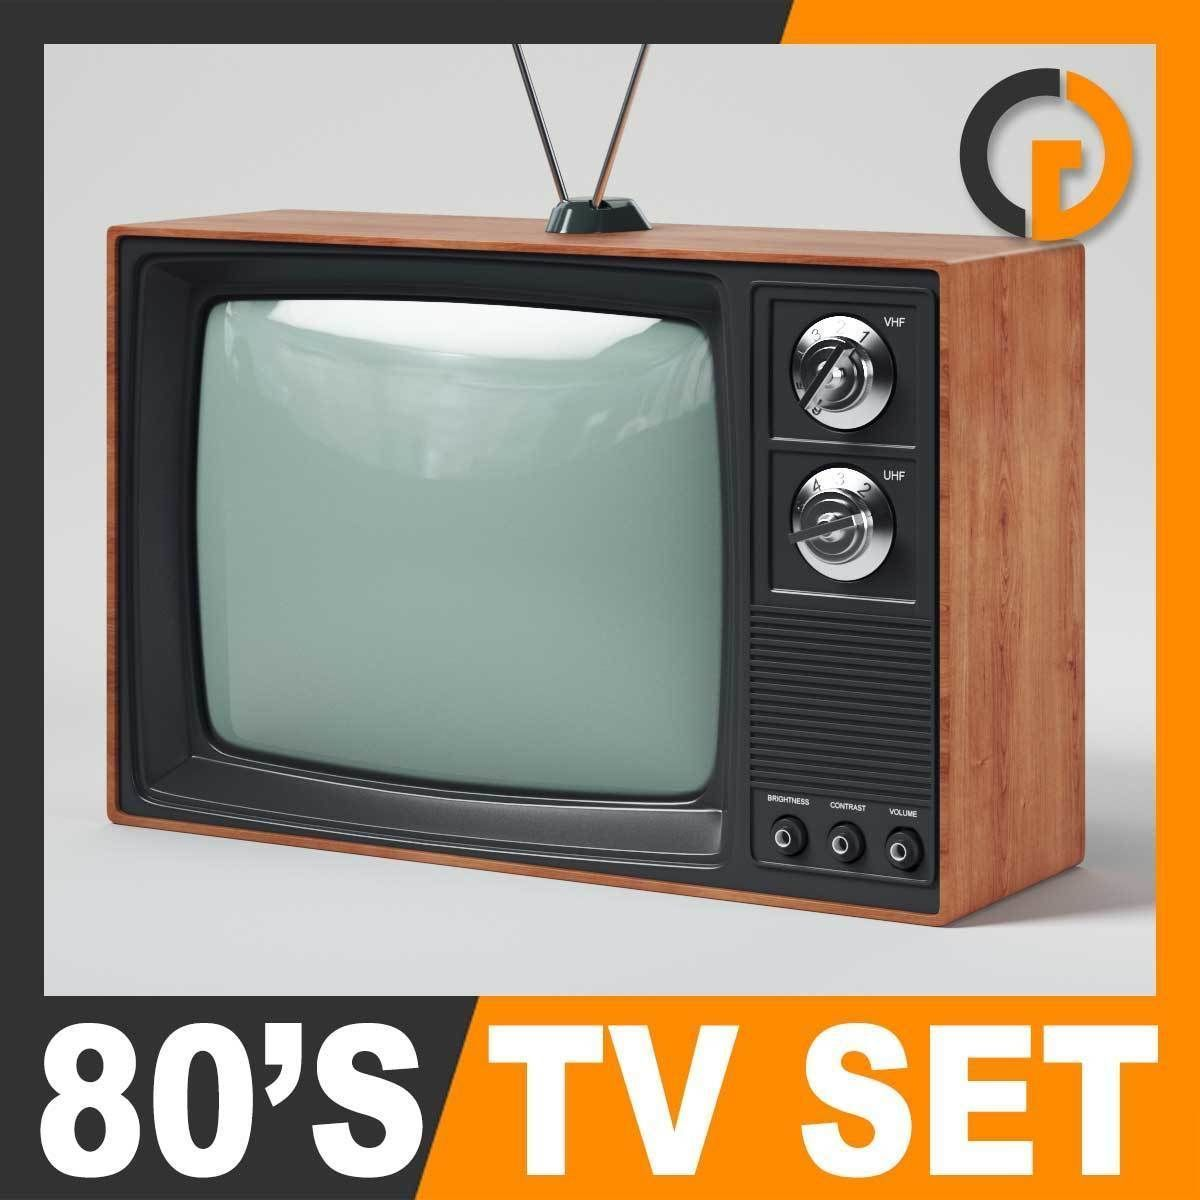 Retro 80s Television Set